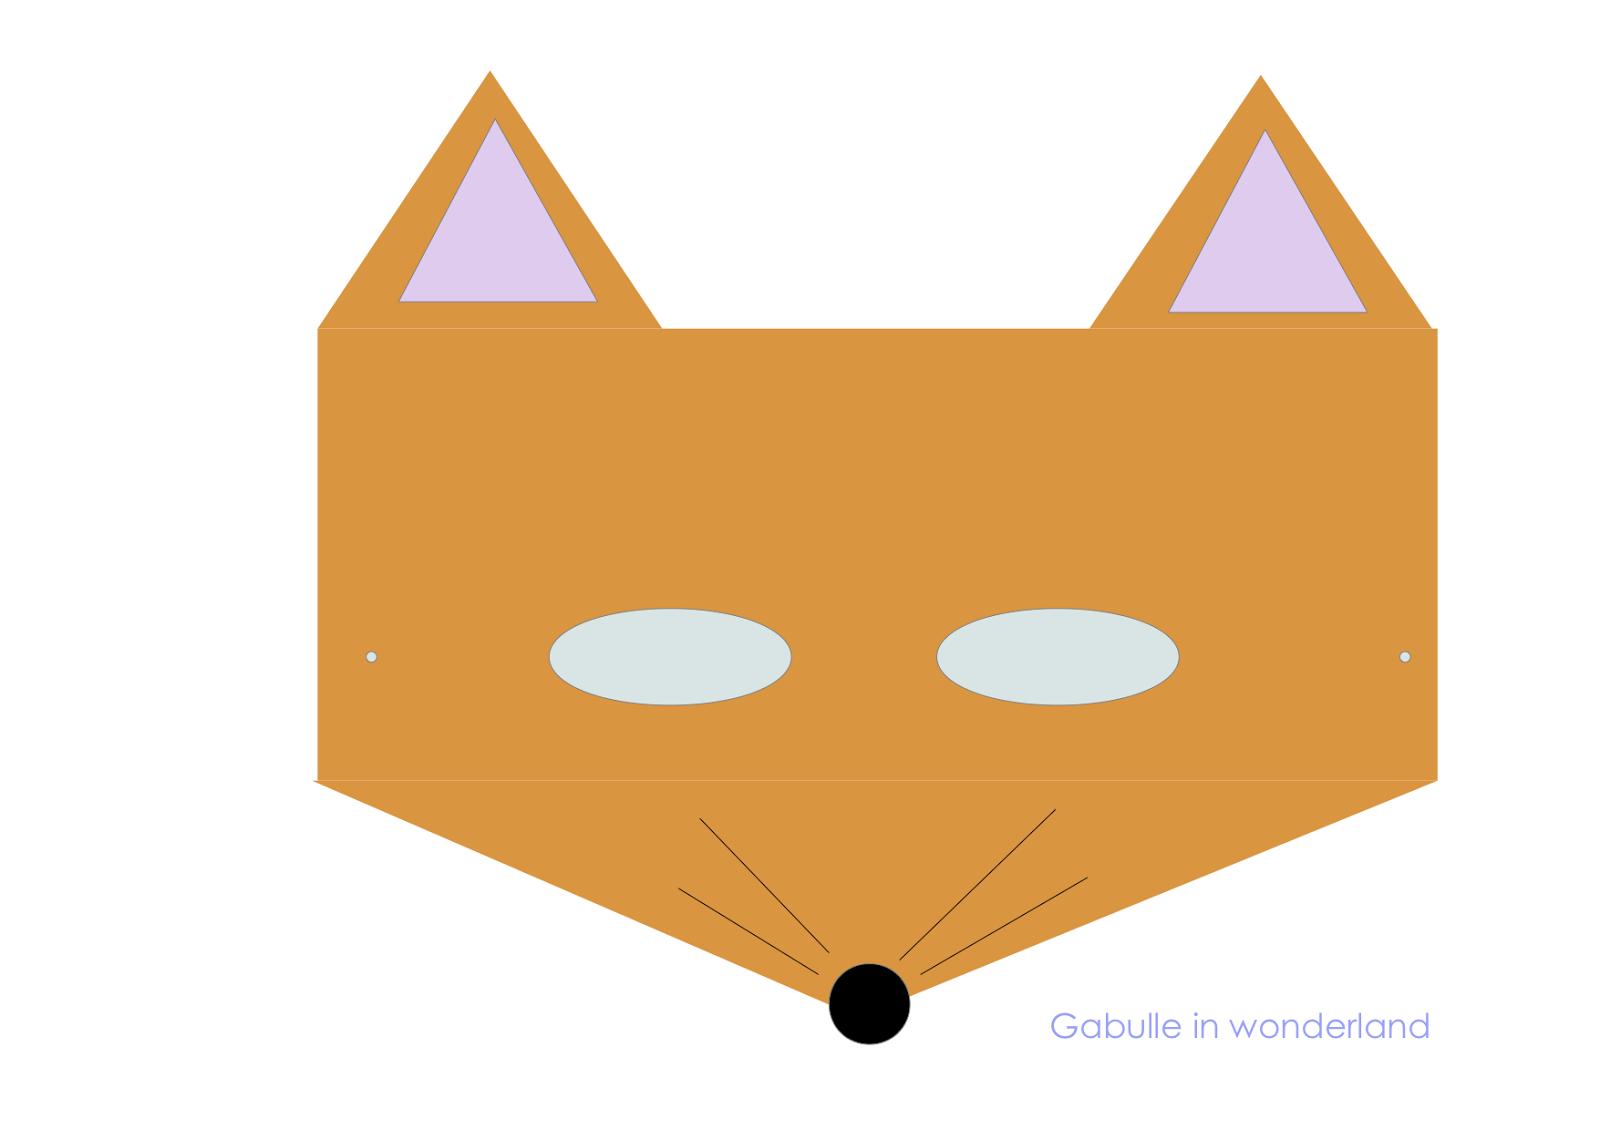 Gabulle in wonderland masques pour enfants imprimer lapin renard et chat - Masque de renard a imprimer ...